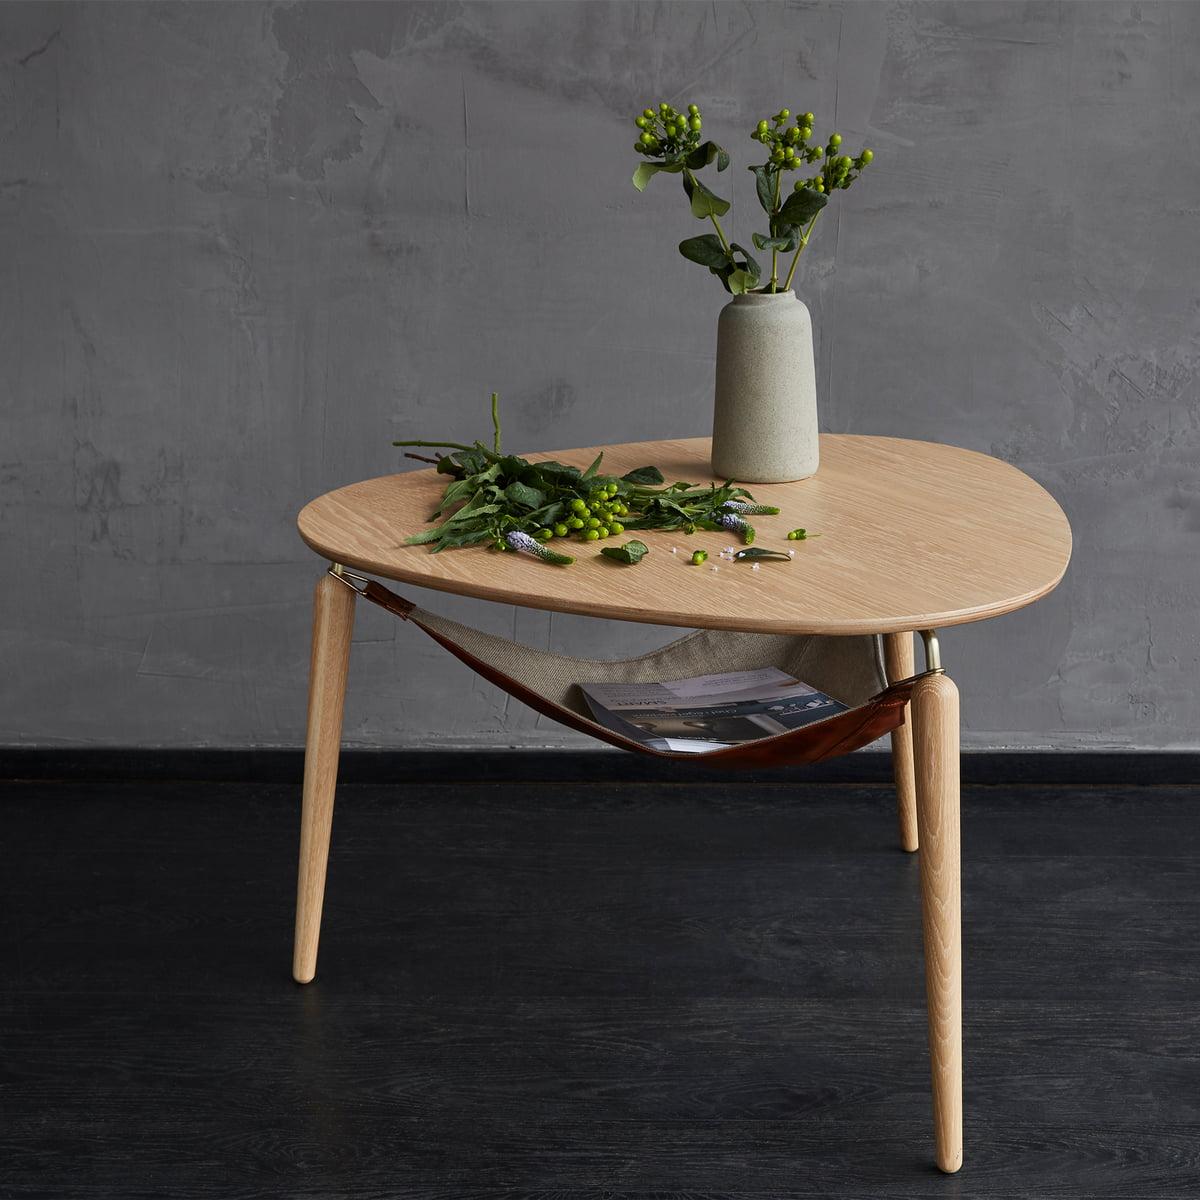 couchtisch hang out von vita connox. Black Bedroom Furniture Sets. Home Design Ideas